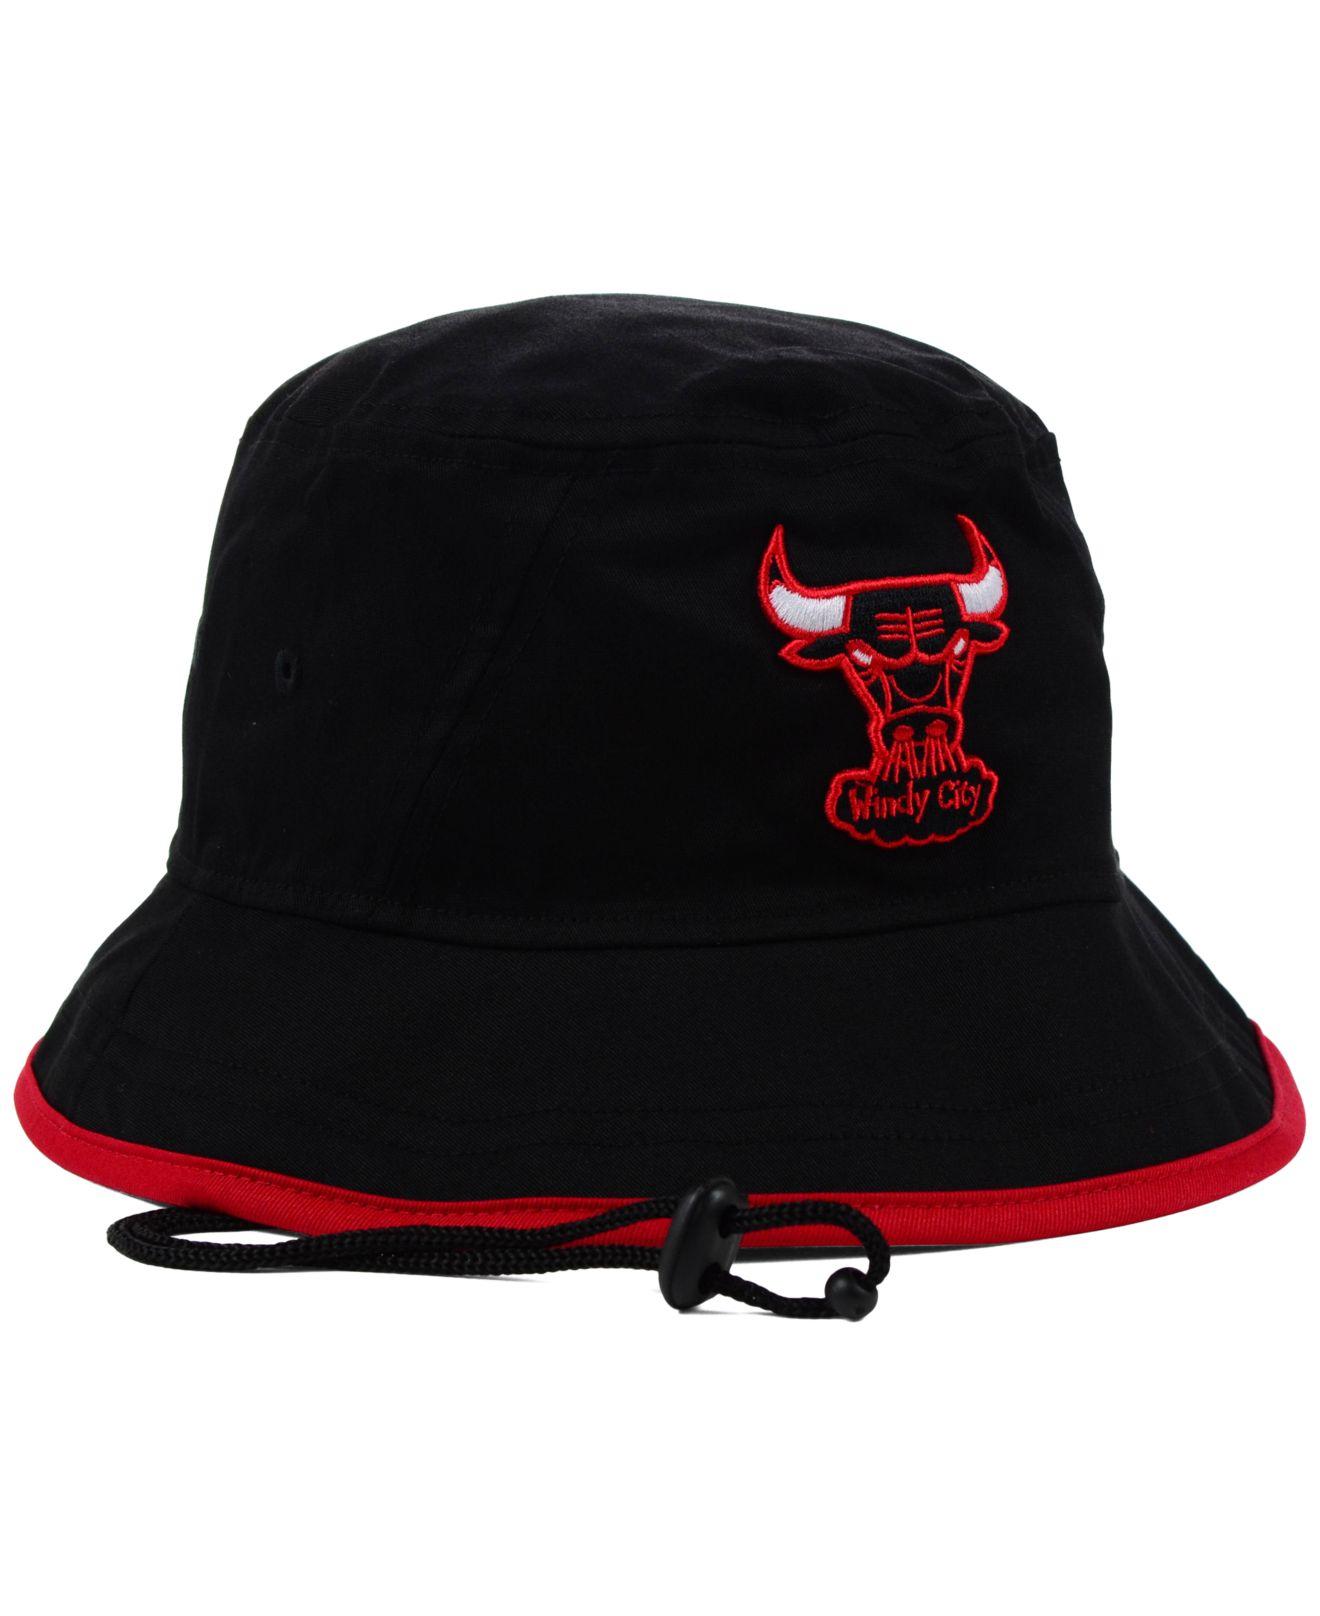 6c43be95b02 Lyst - KTZ Chicago Bulls Nba Hardwood Classics Basic Tipped Bucket ...